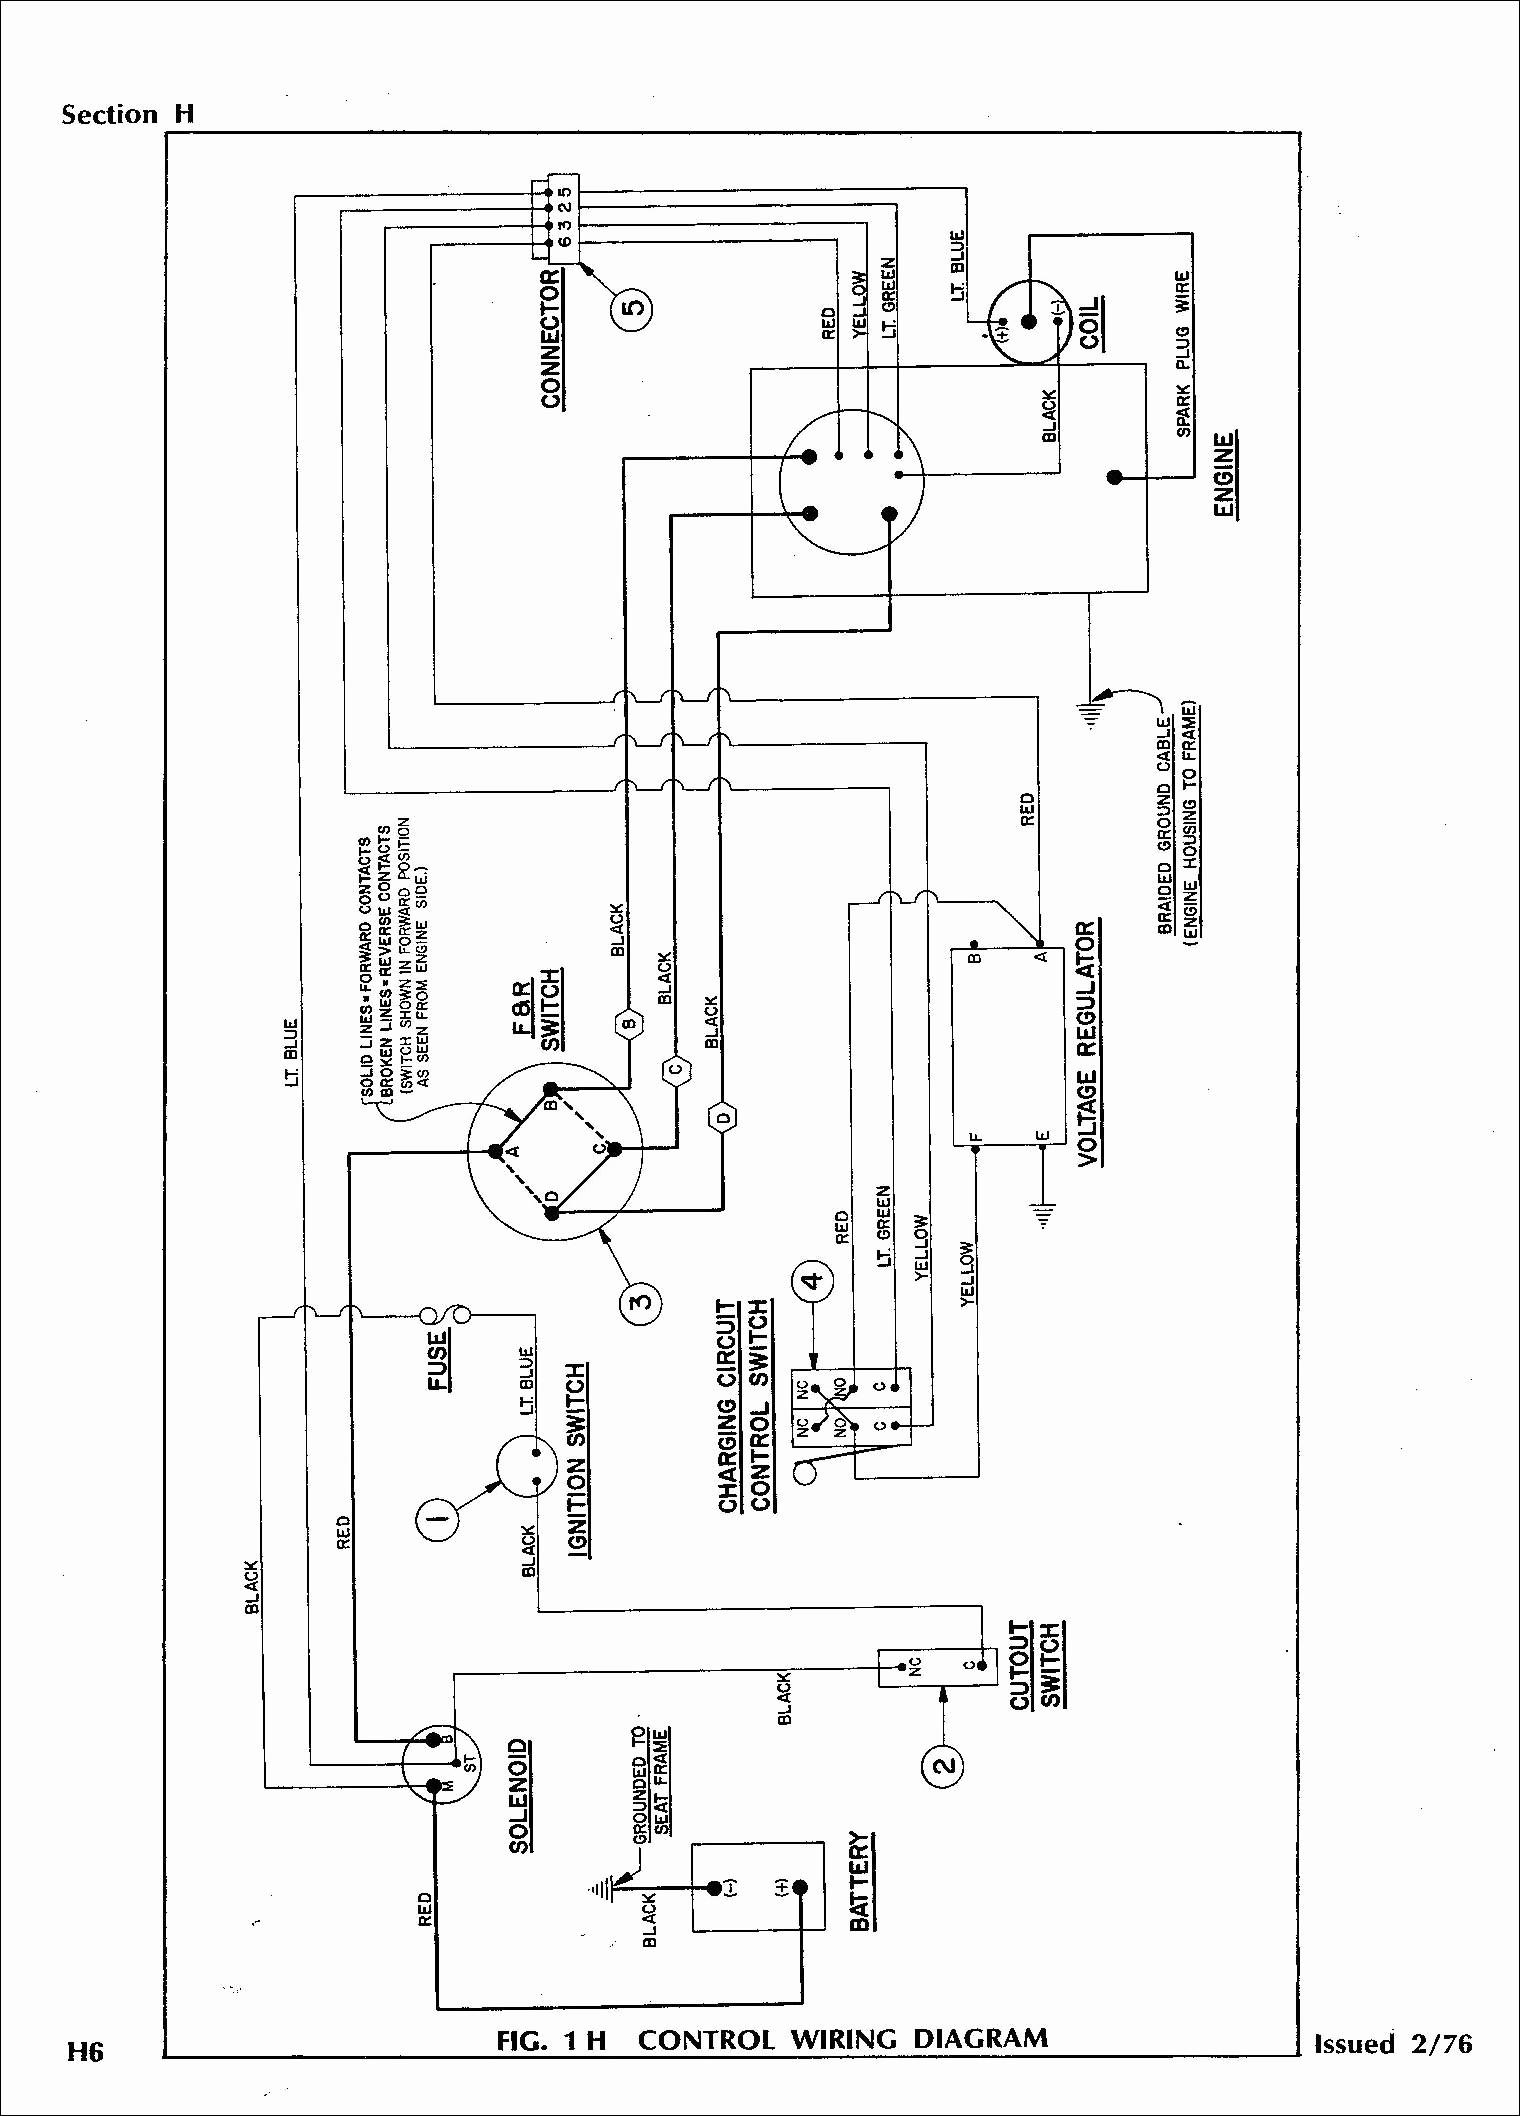 Iring Diagram Fog Lights Drl Mediatown 360 2003 Forester Light Wiring Chevrolet S10 Best Site Harness Rh Omniwindenergy Com